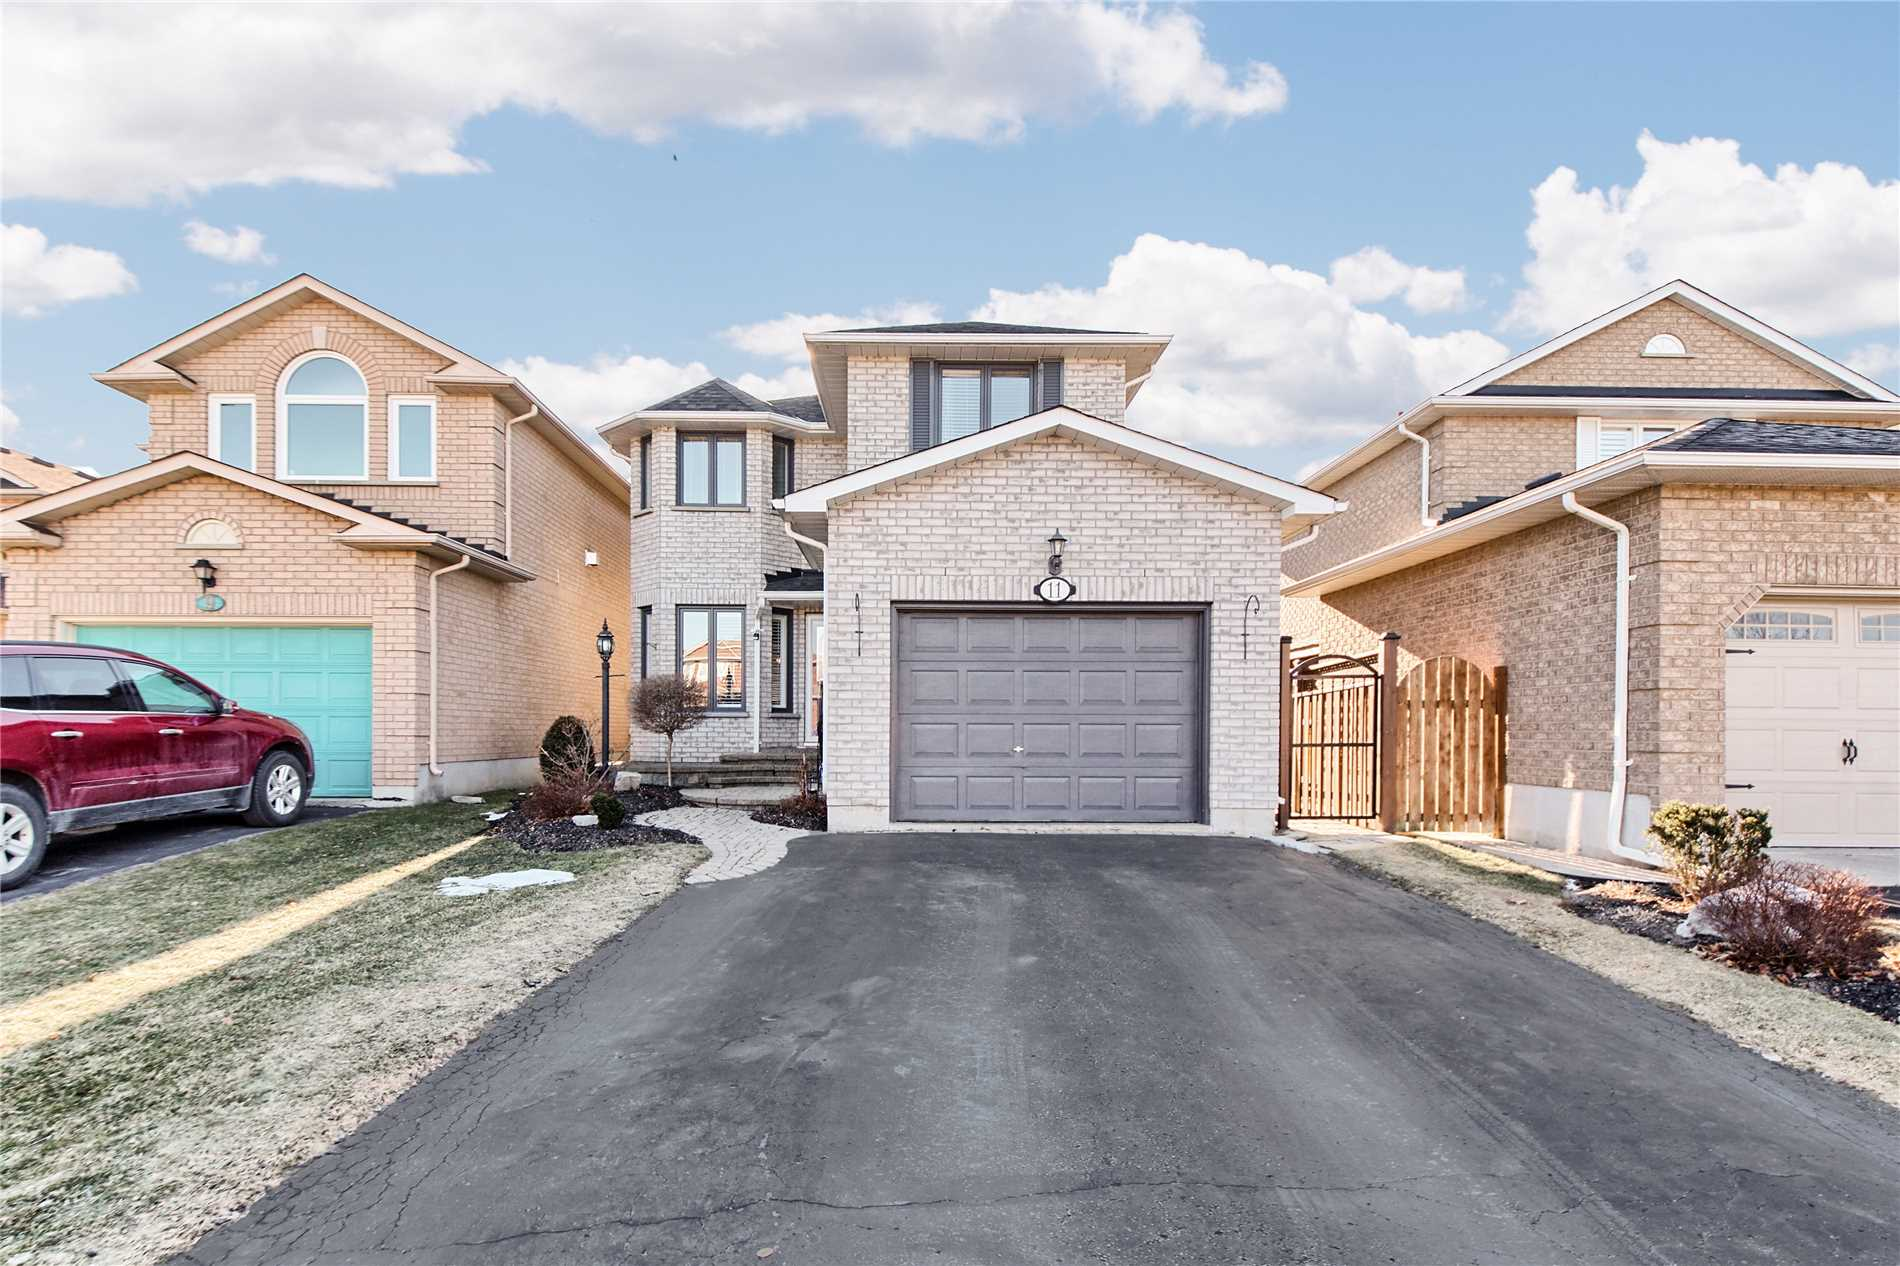 House for sale at 11 Caleche Avenue Clarington Ontario - MLS: E4336053